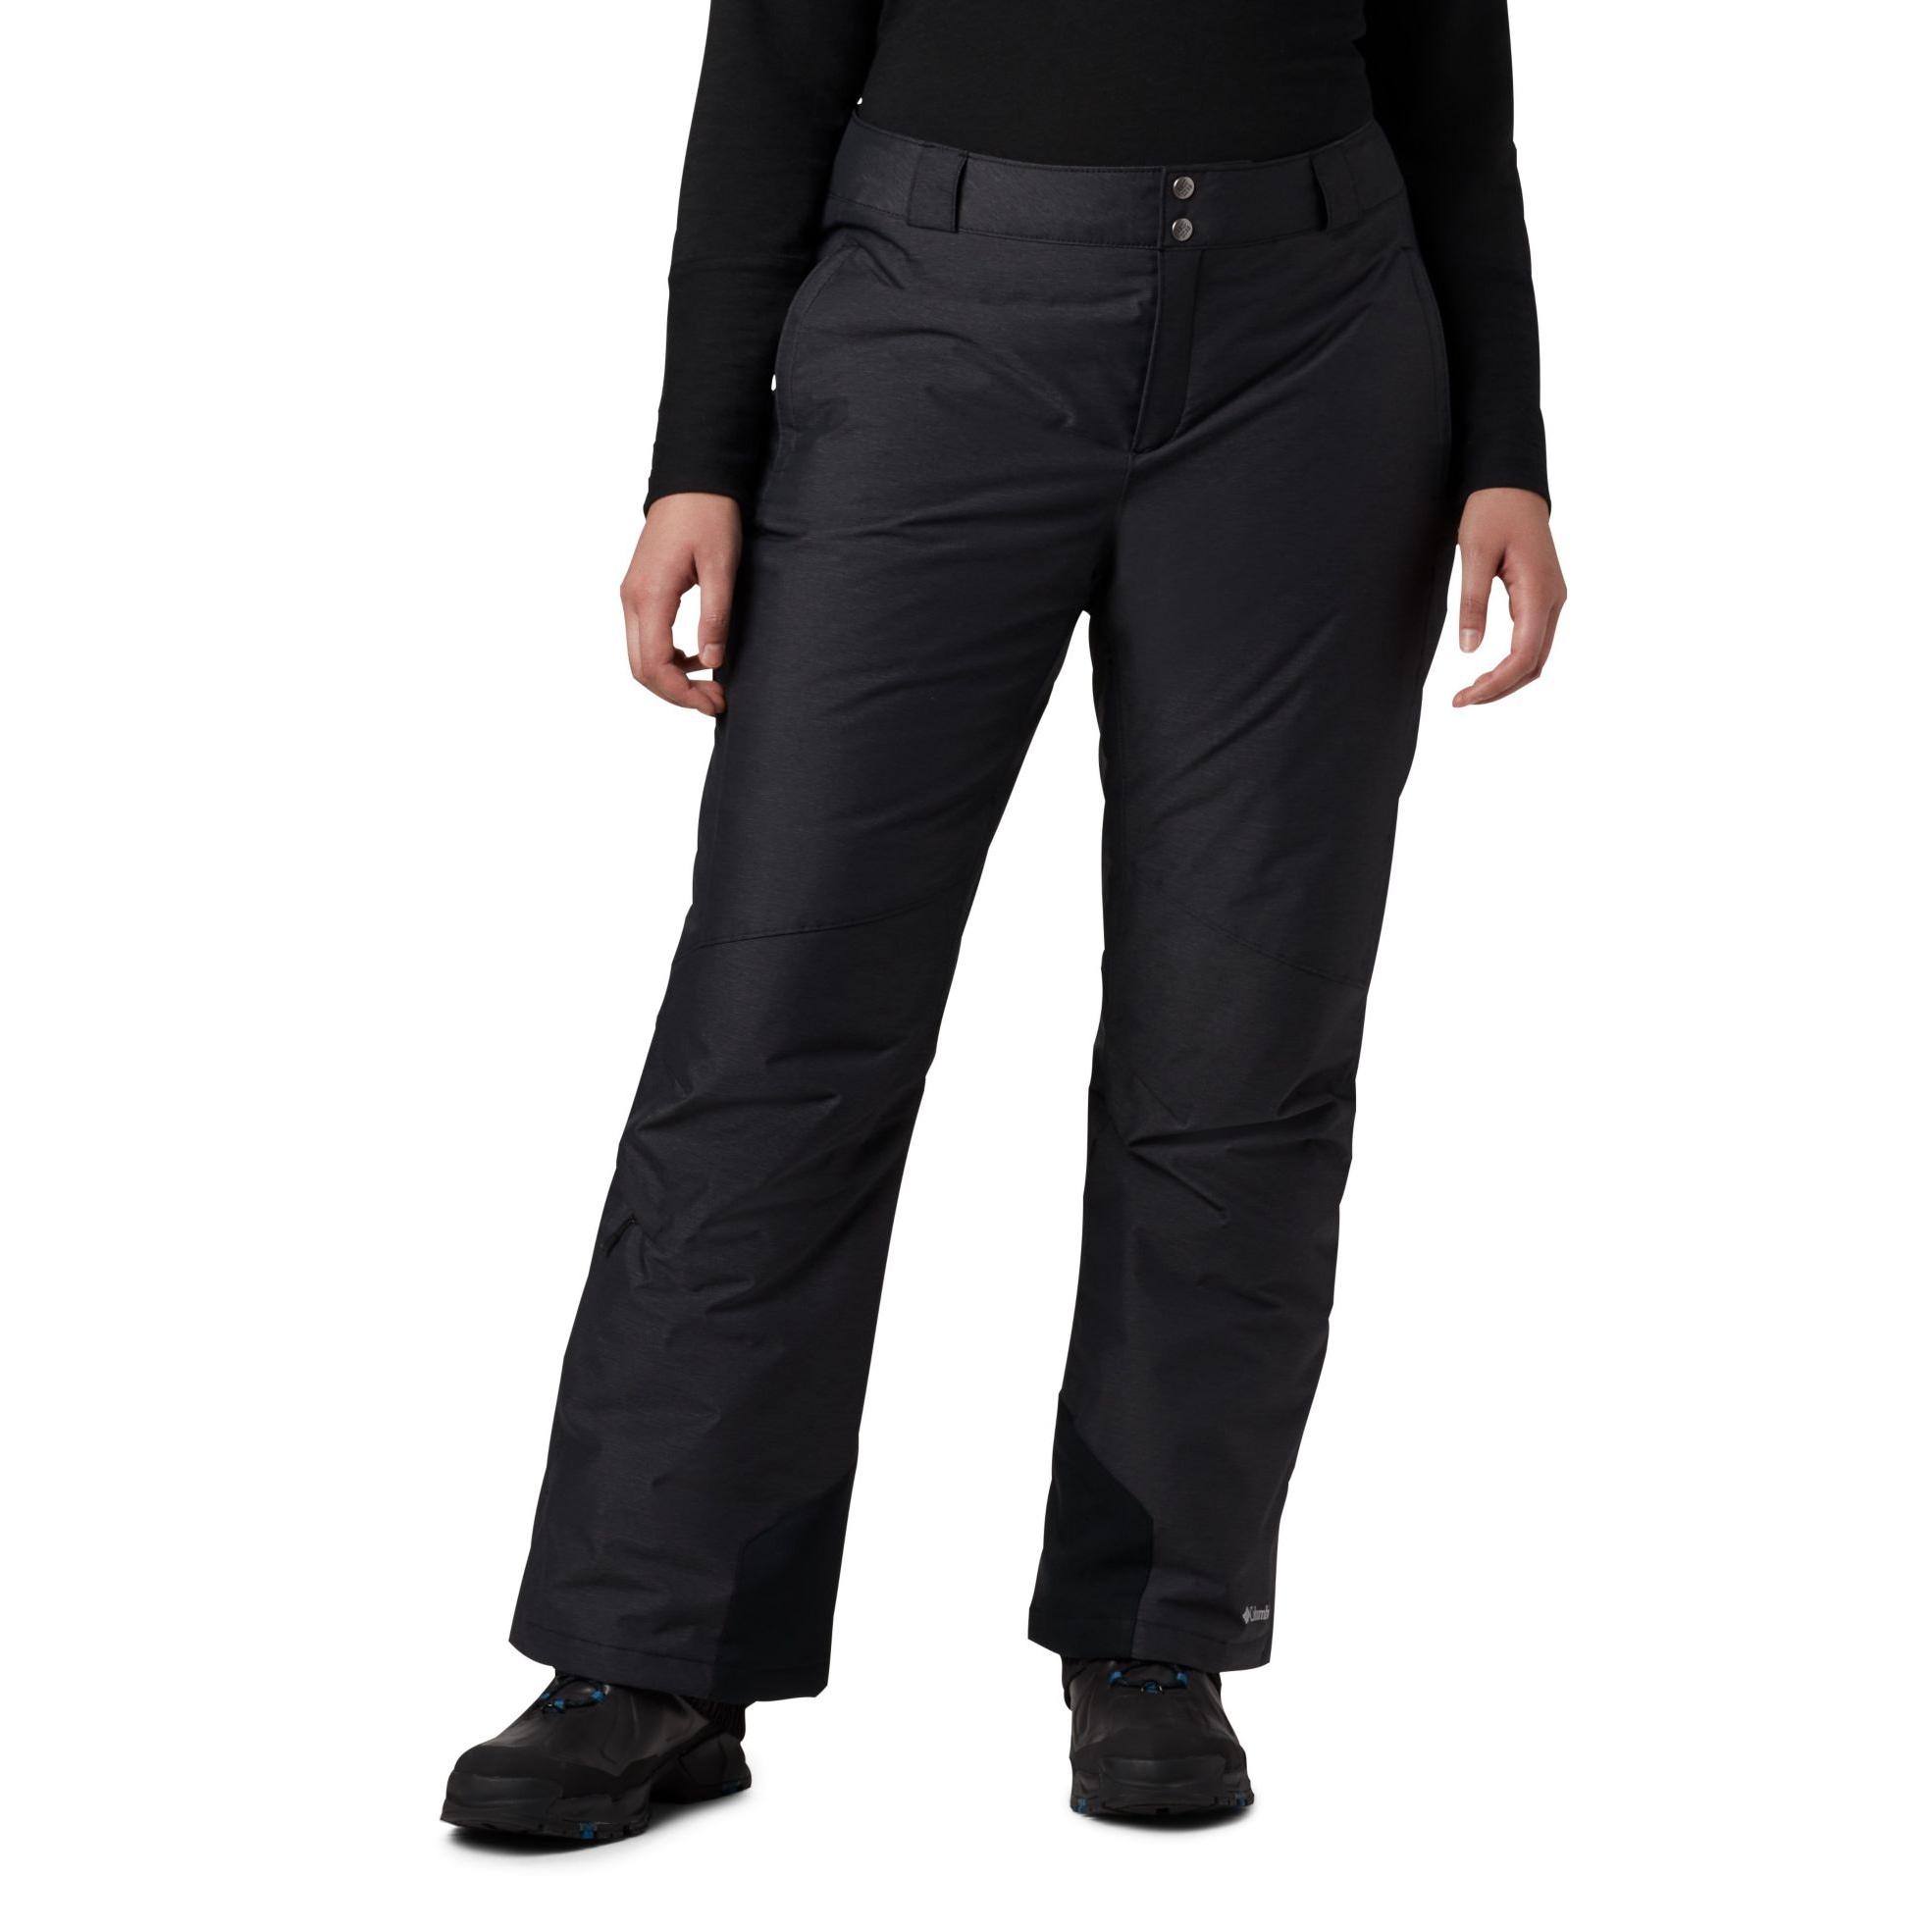 Bugaboo Omni Heat Pant Plus - Women's